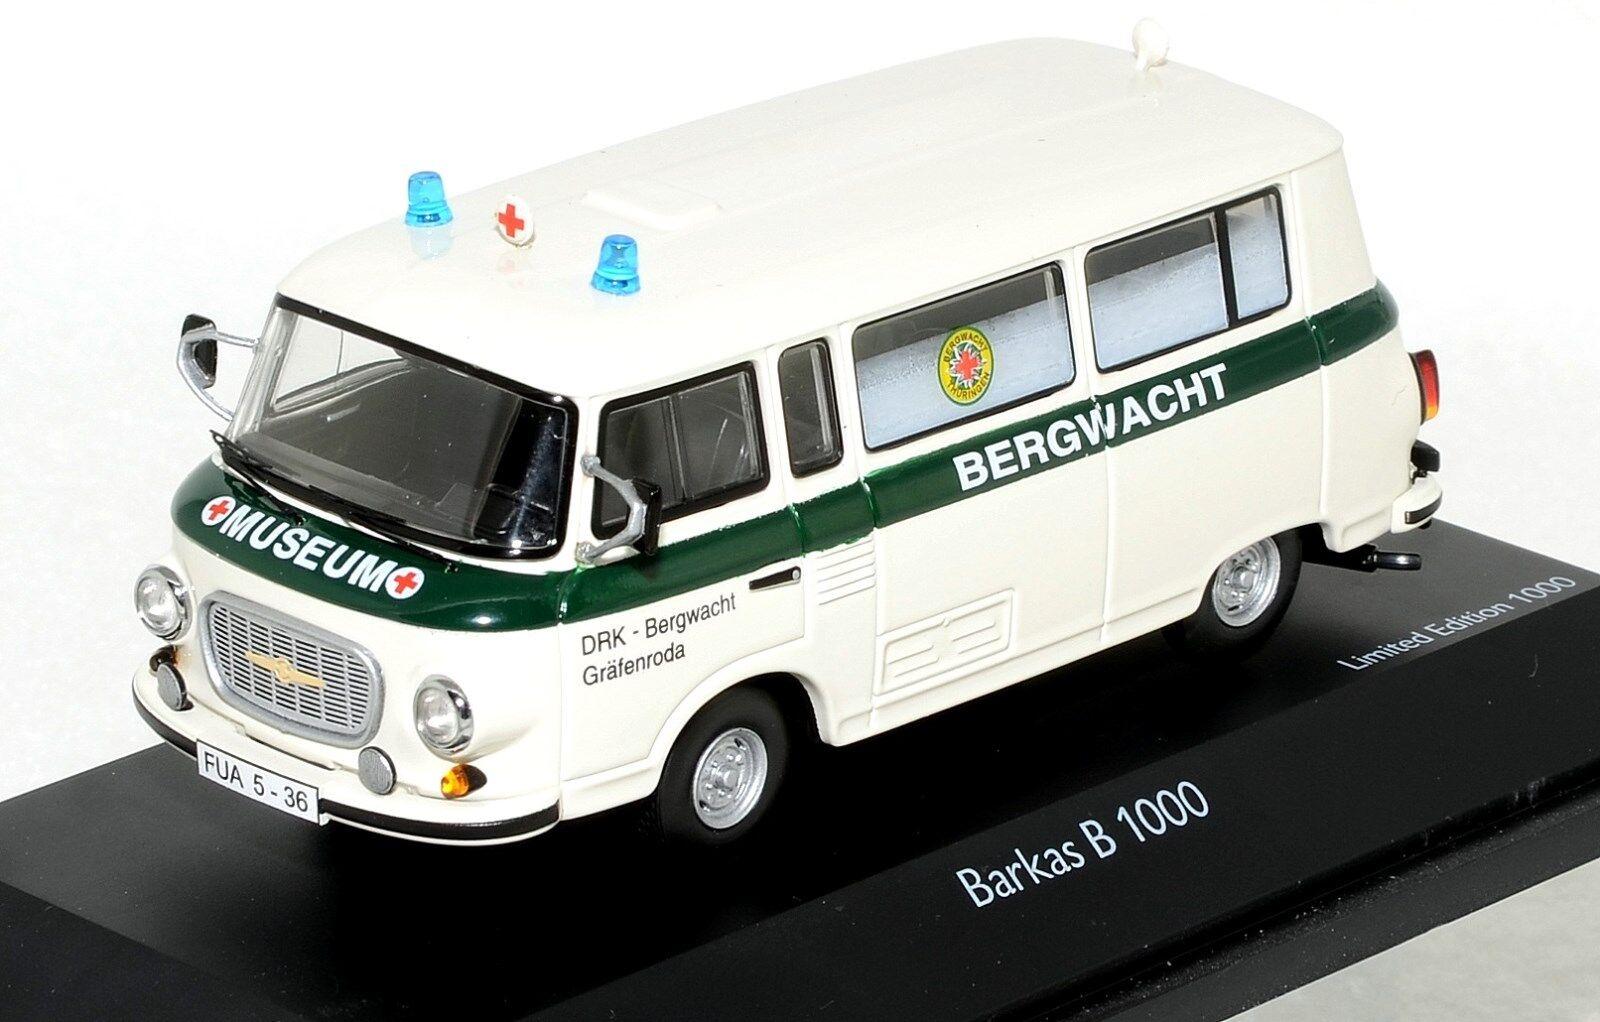 Sällsynta 1  43 skala SCHUCO 450365300 Barkas B1000 DRK Bergwacht MIB